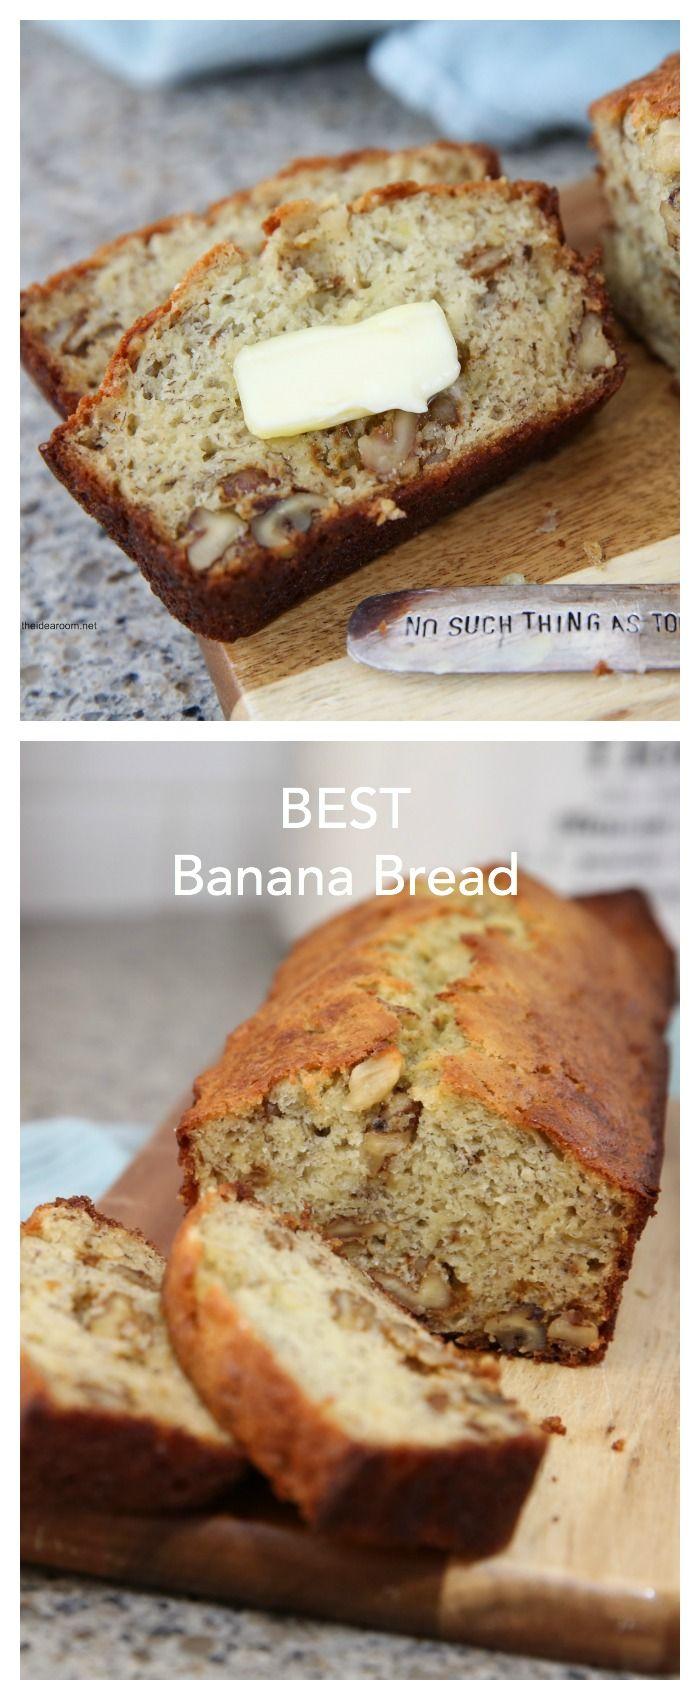 Recipes- Bread and Rolls| Best Banana Bread Recipe